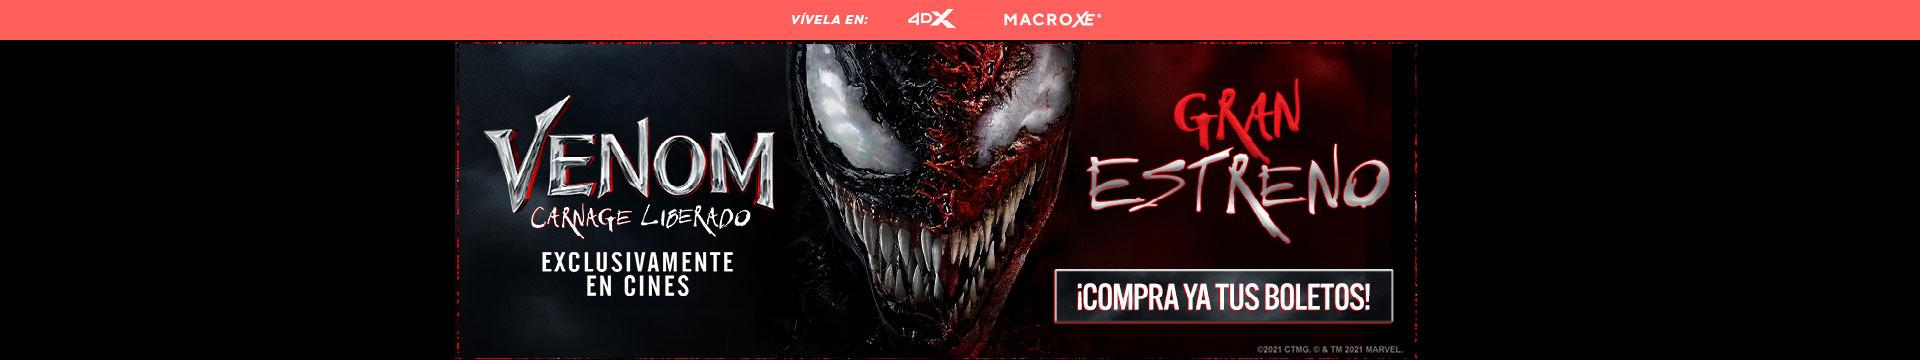 Estreno: Venom Carnage Liberado